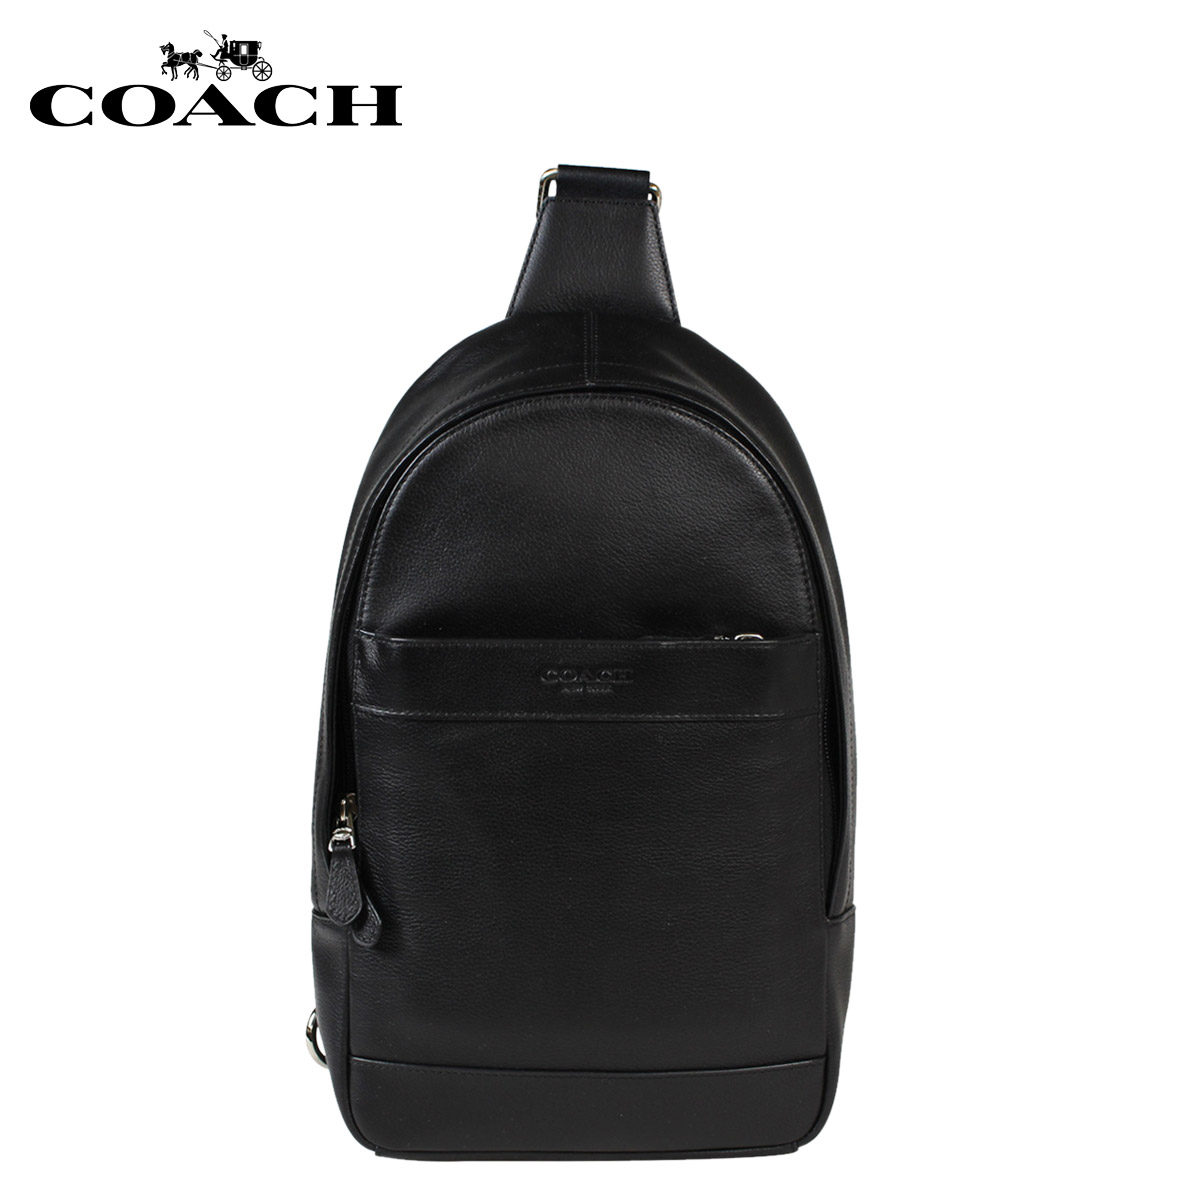 Sugar Online Shop | Rakuten Global Market: COACH coach men's bags ...